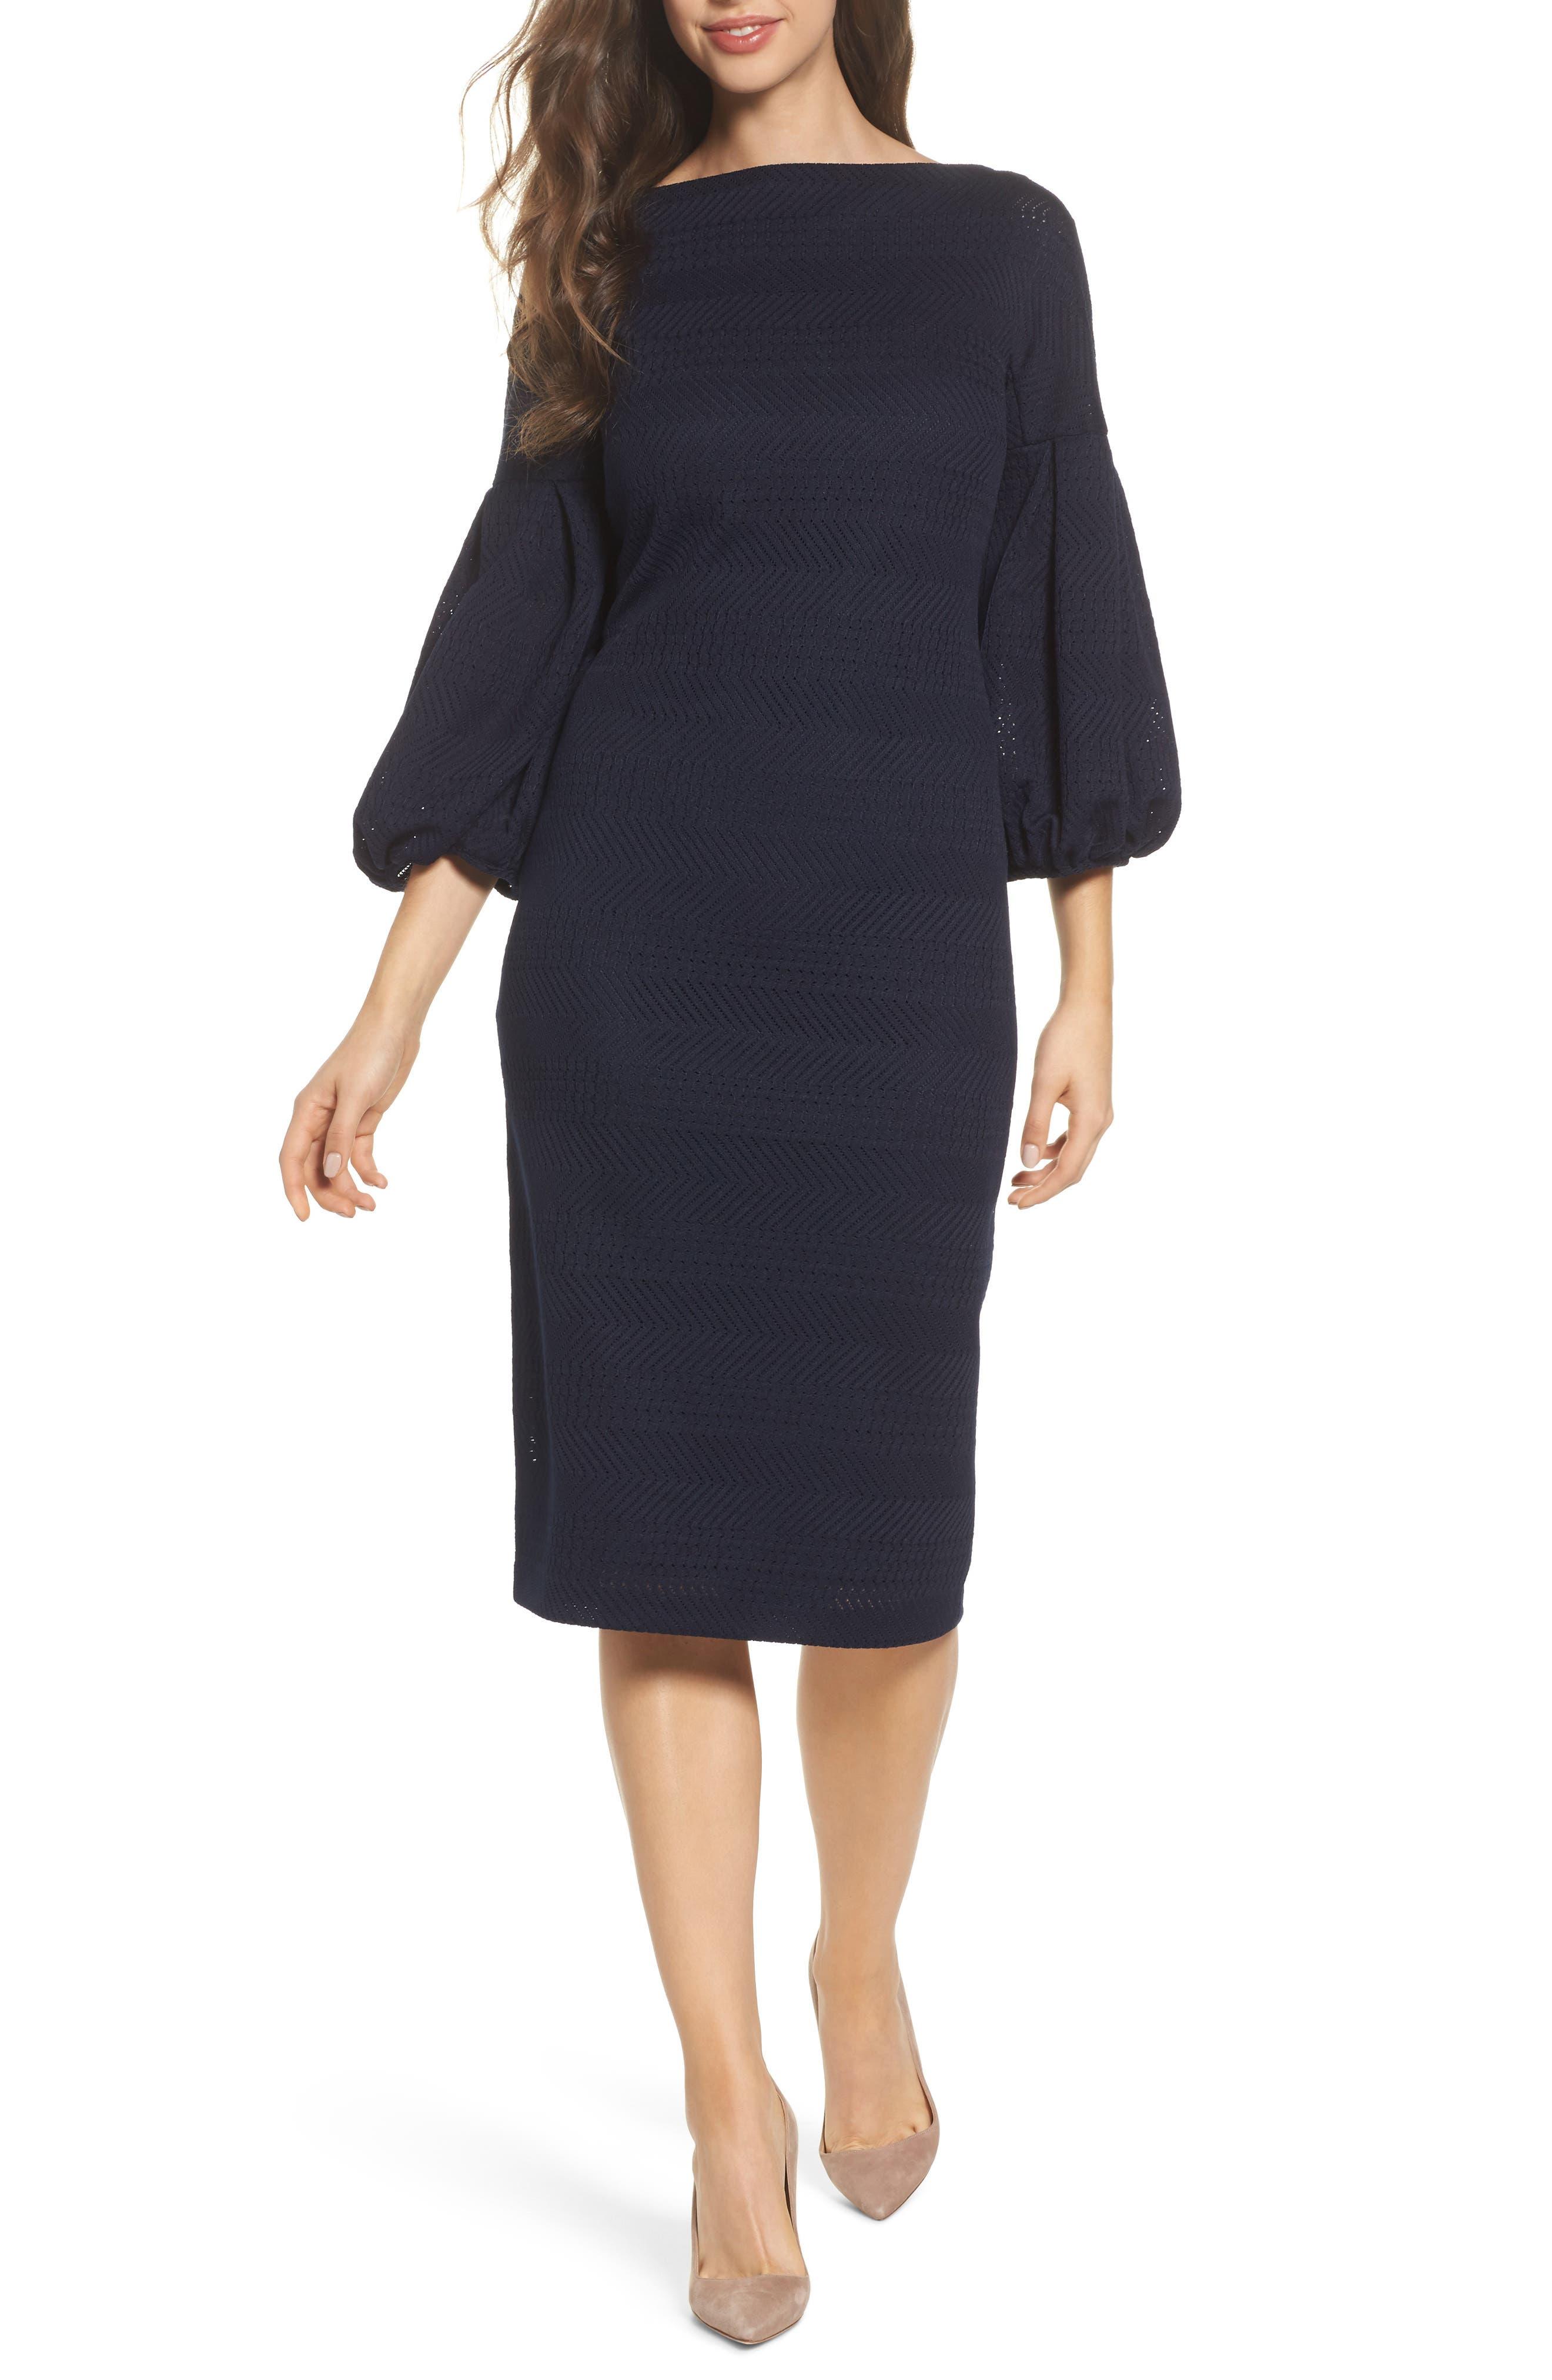 Main Image - Maggy London Solid Herringbone Knit Dress